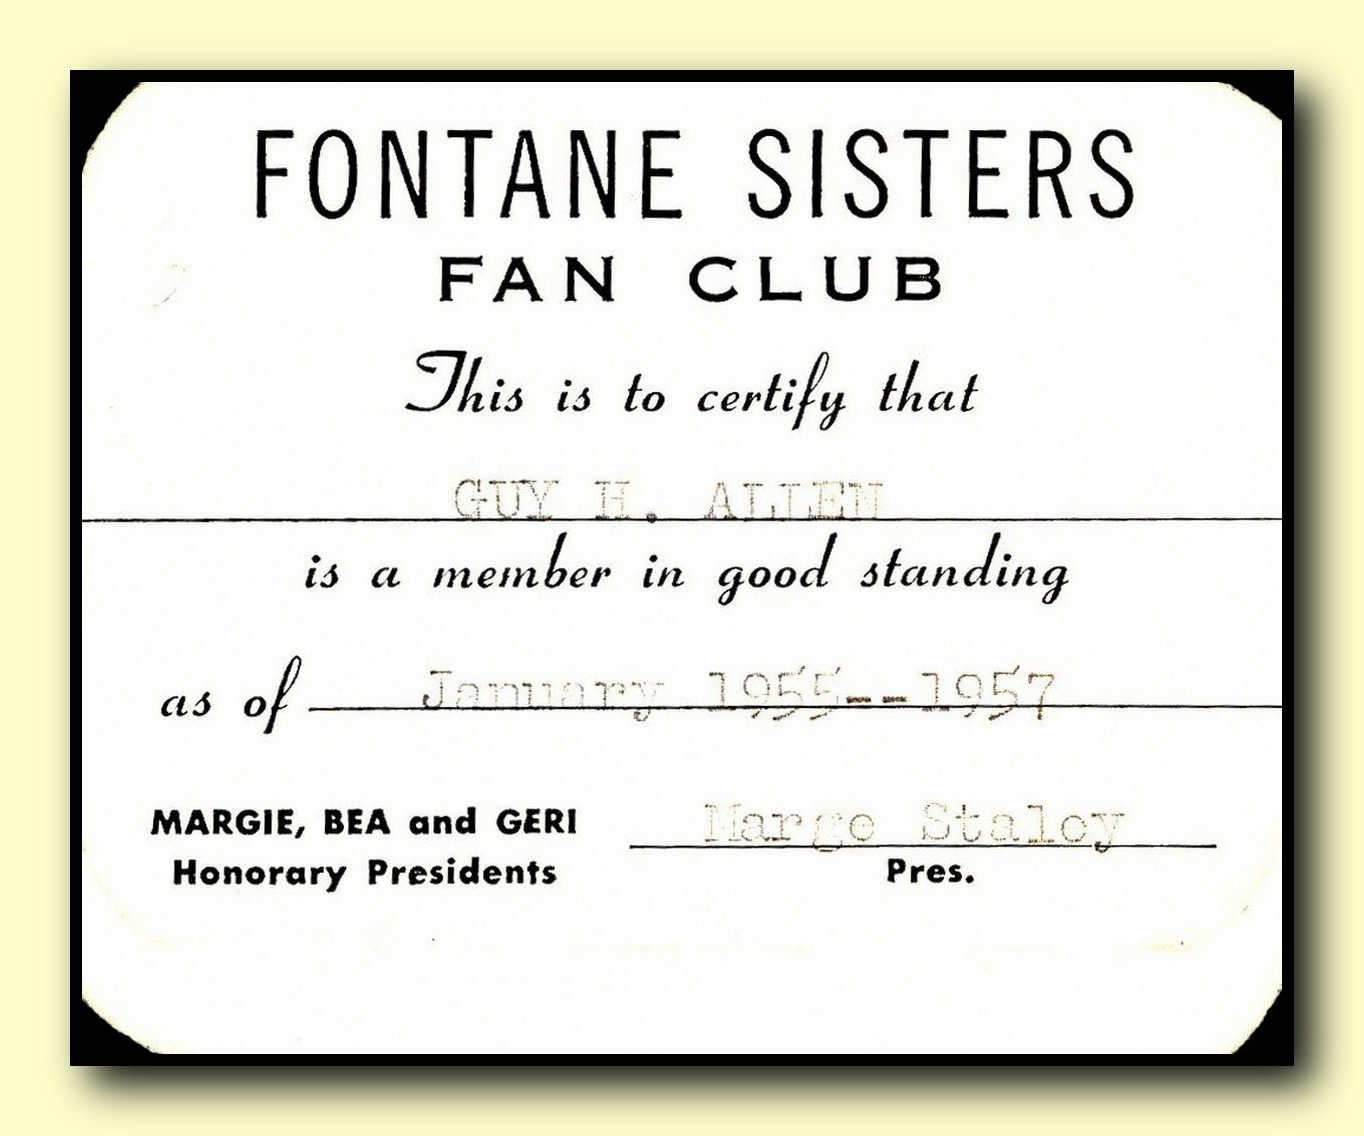 Fontane Sisters